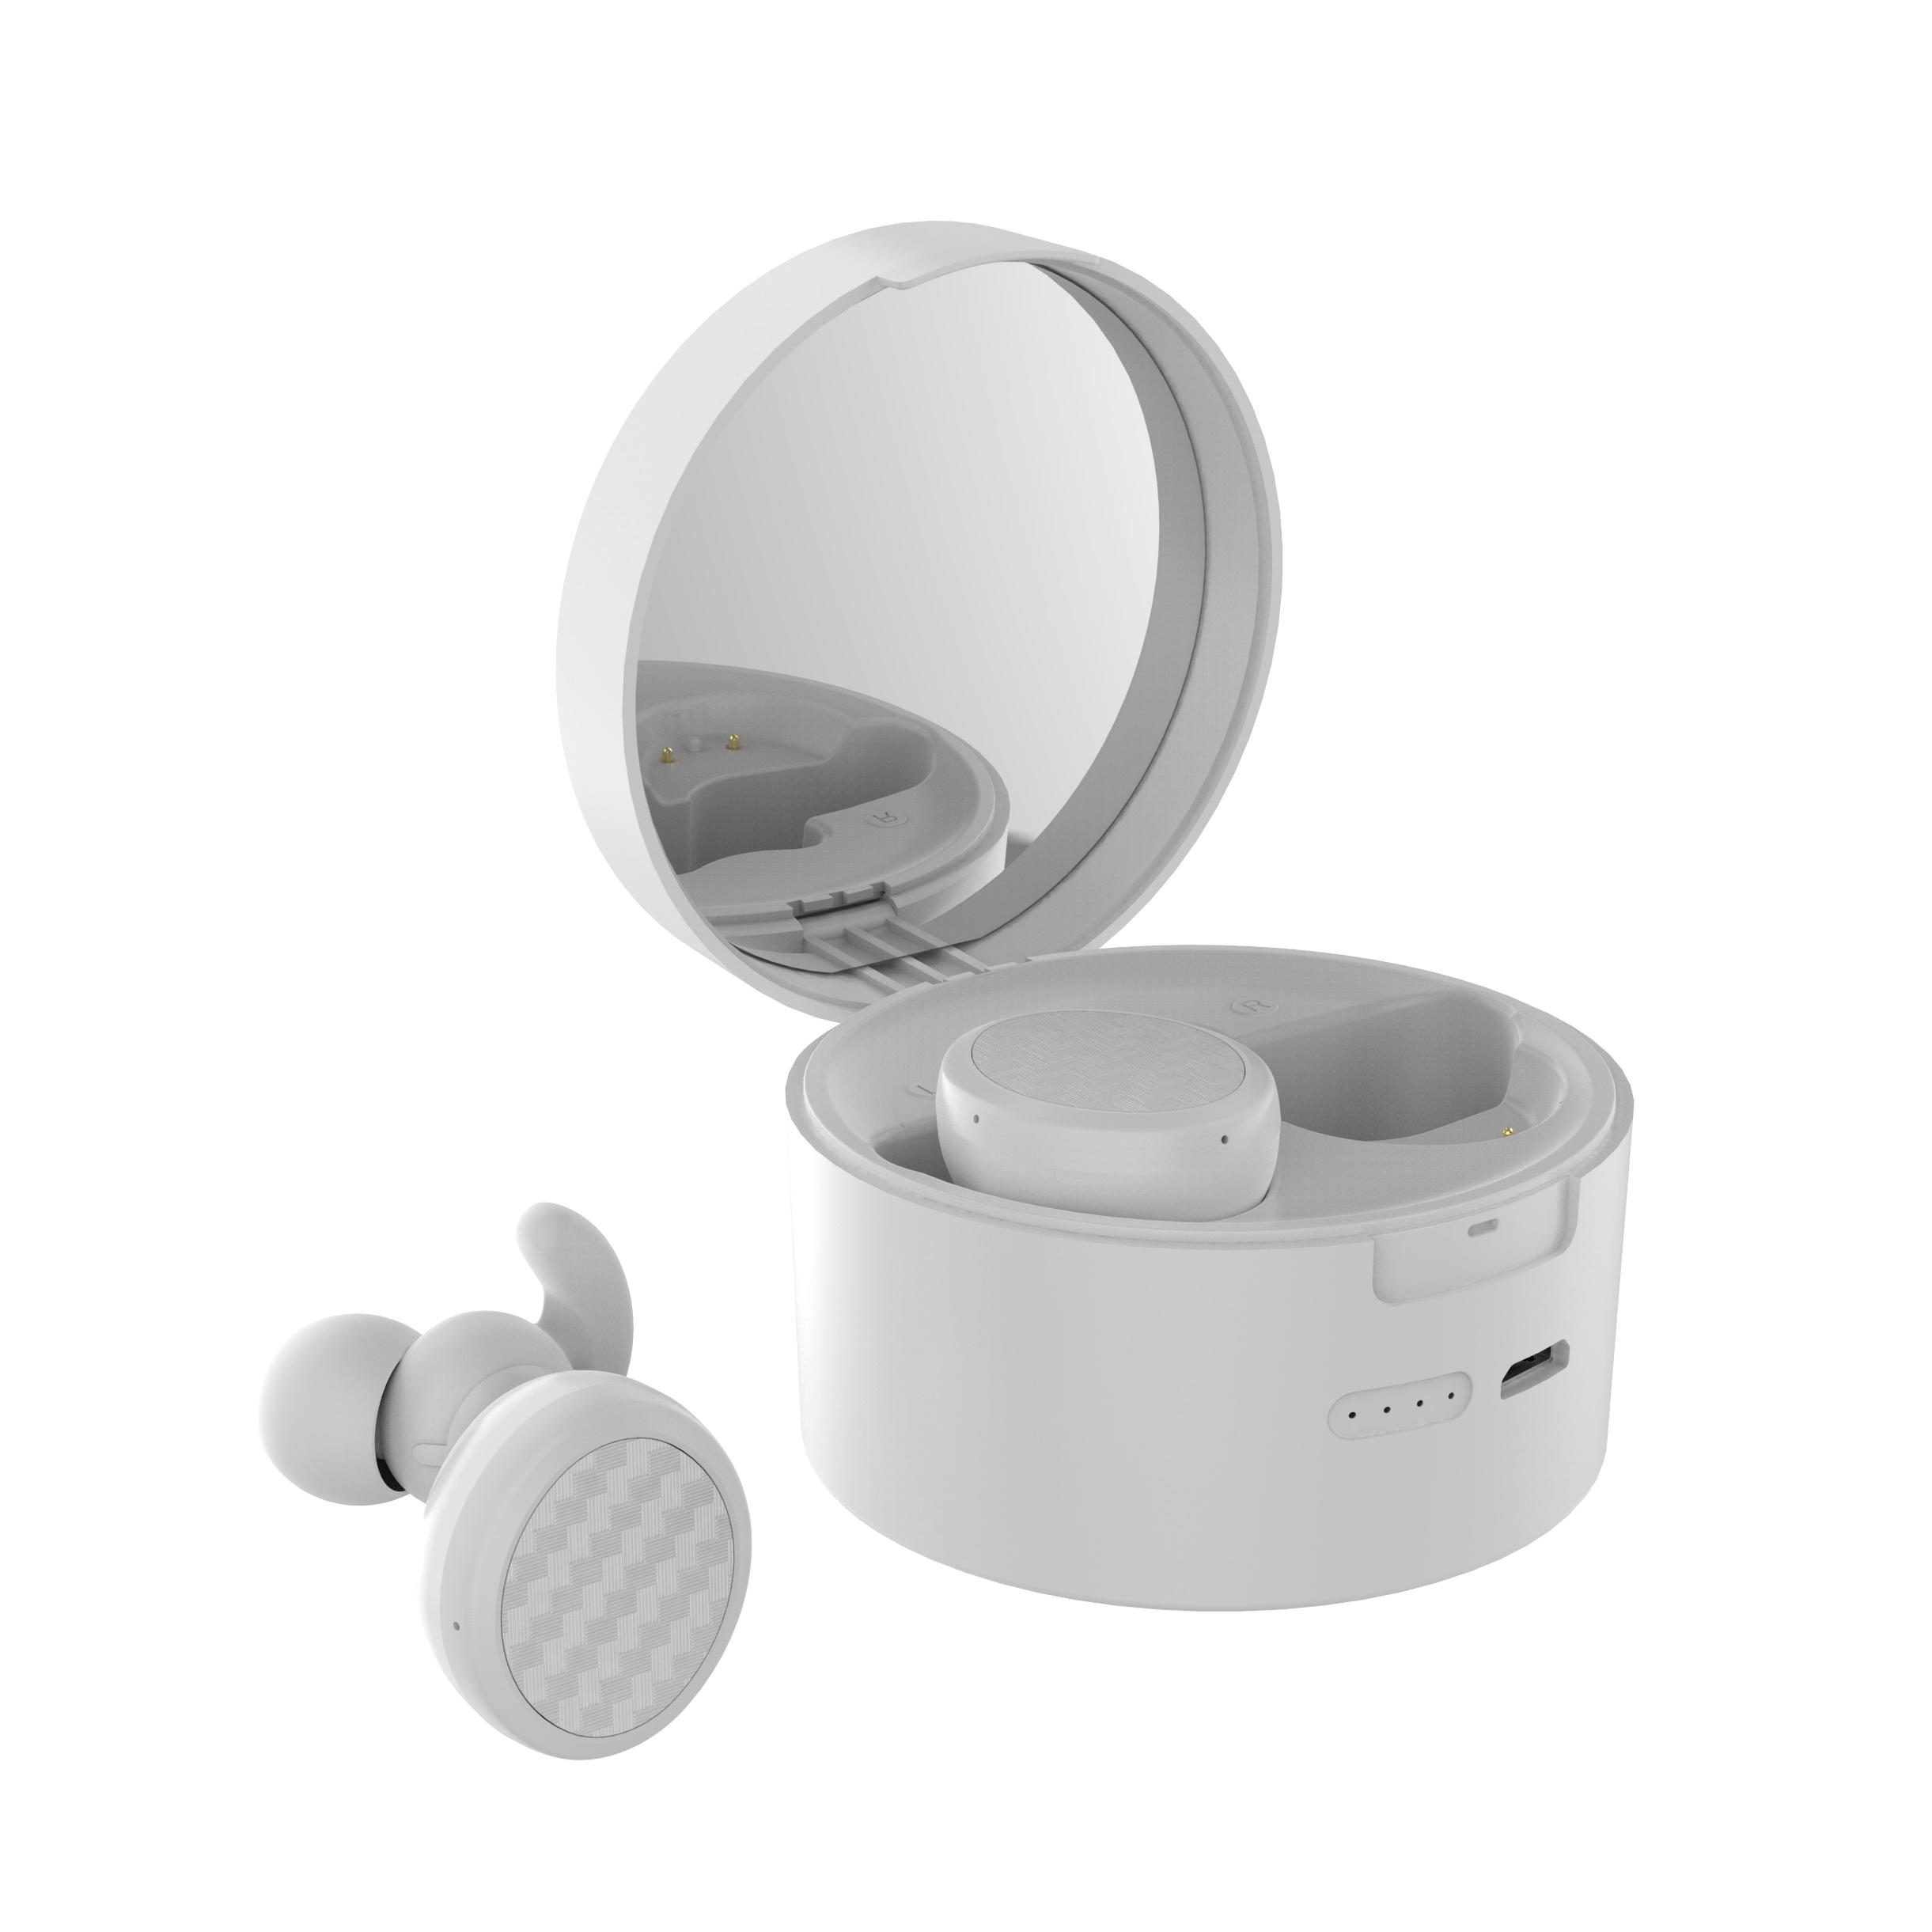 TWS Bluetooth Earphone Cosmetic Mirror 5.0 Earplugs Stereo Wireless Headset Phone Bracket white